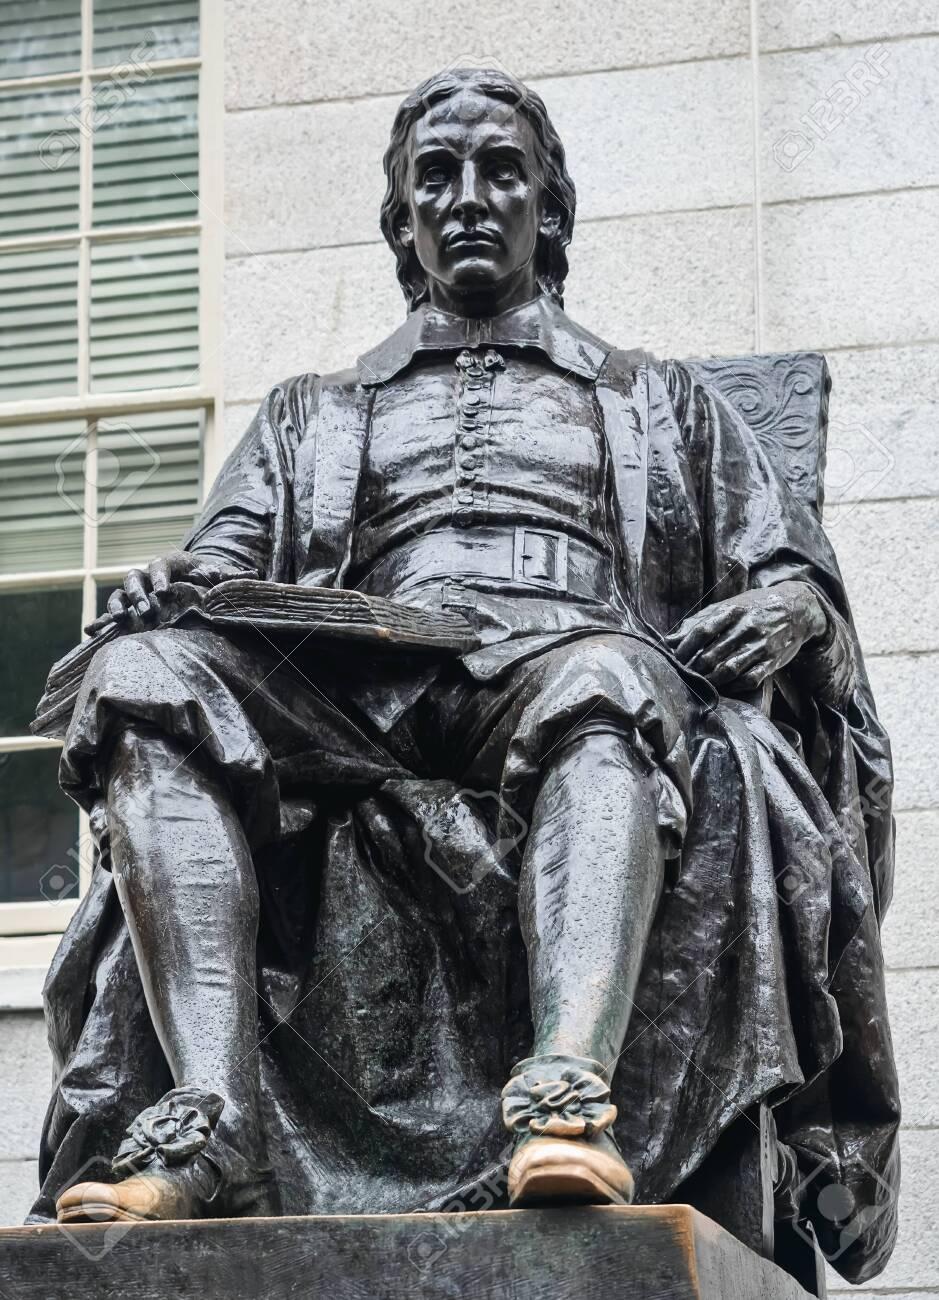 Cambridge, Massachusetts, USA, September 25, 2018. Harvard University, sculpture of John Harvard, in the center of Harvard Yard, the oldest area of the campus. - 132499994